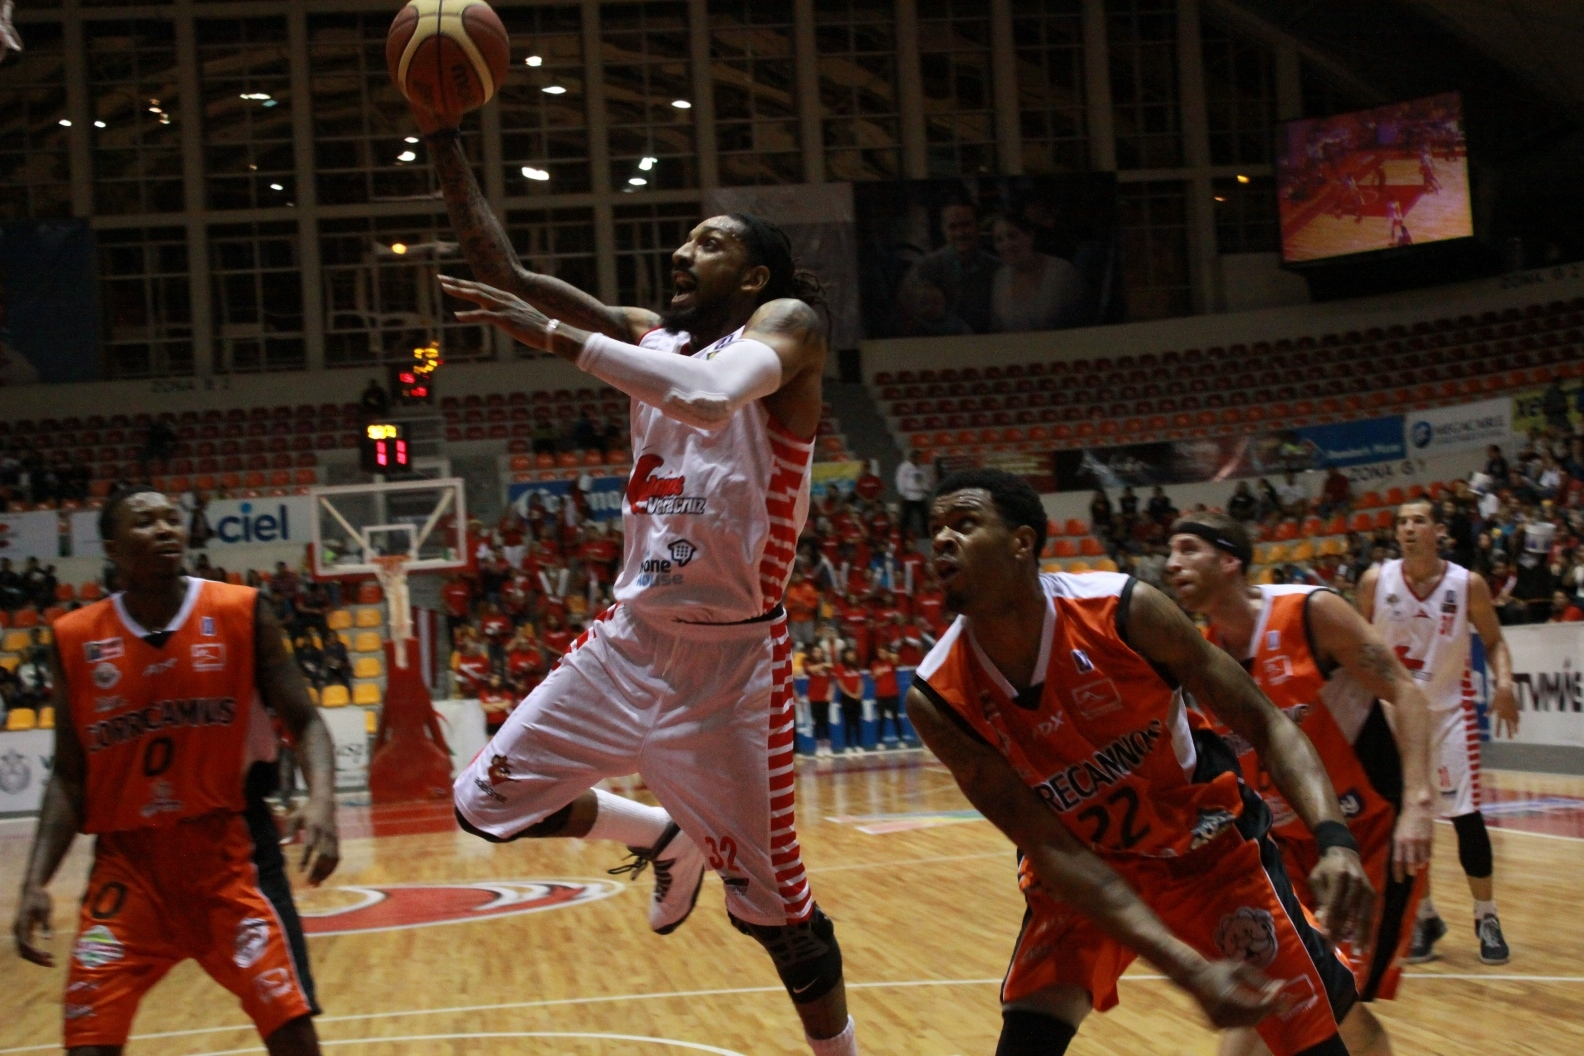 LNBP en viva basquet